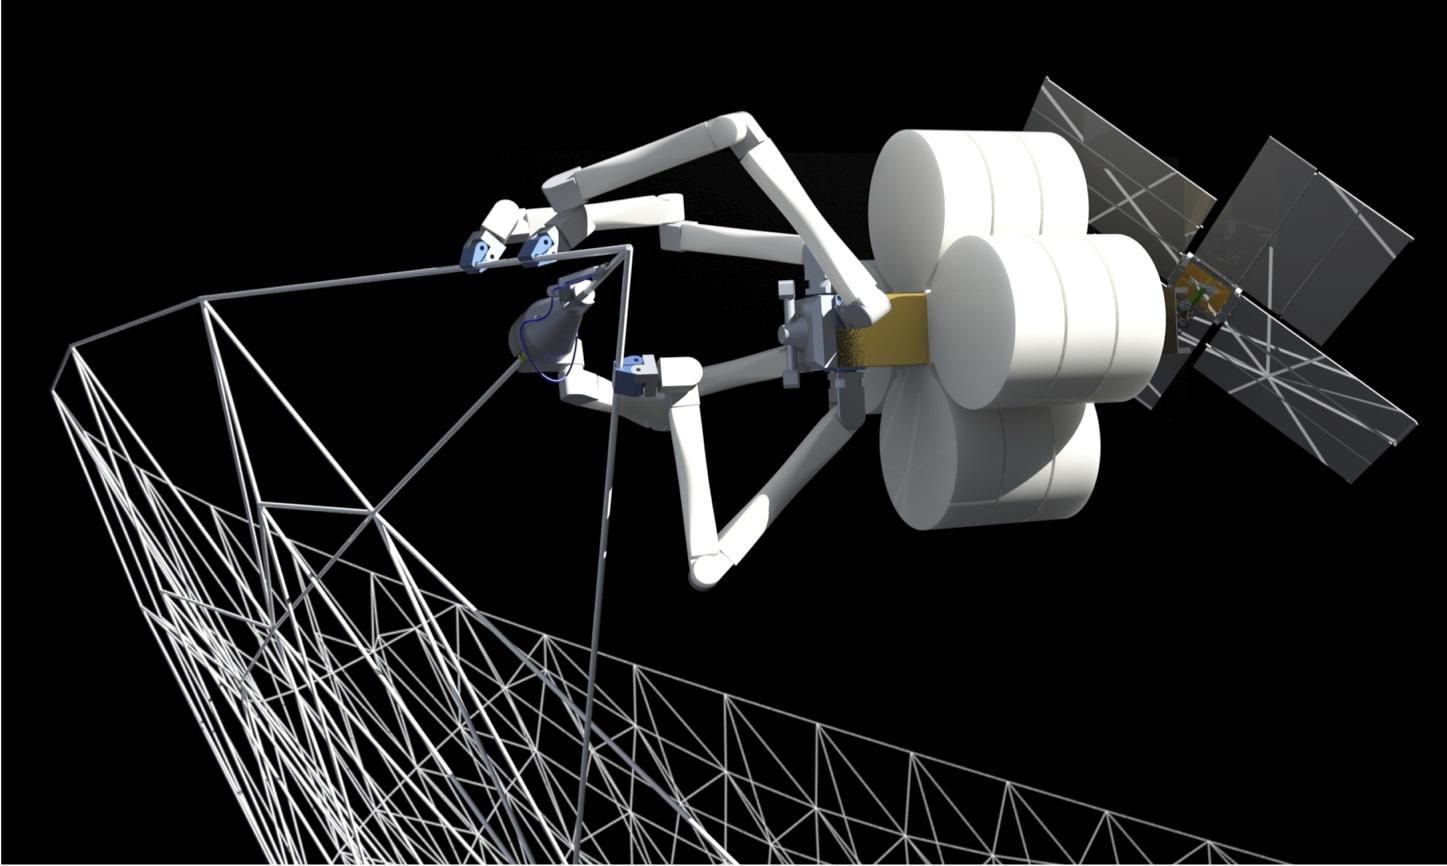 3D Printing In The Vacuum Of Space